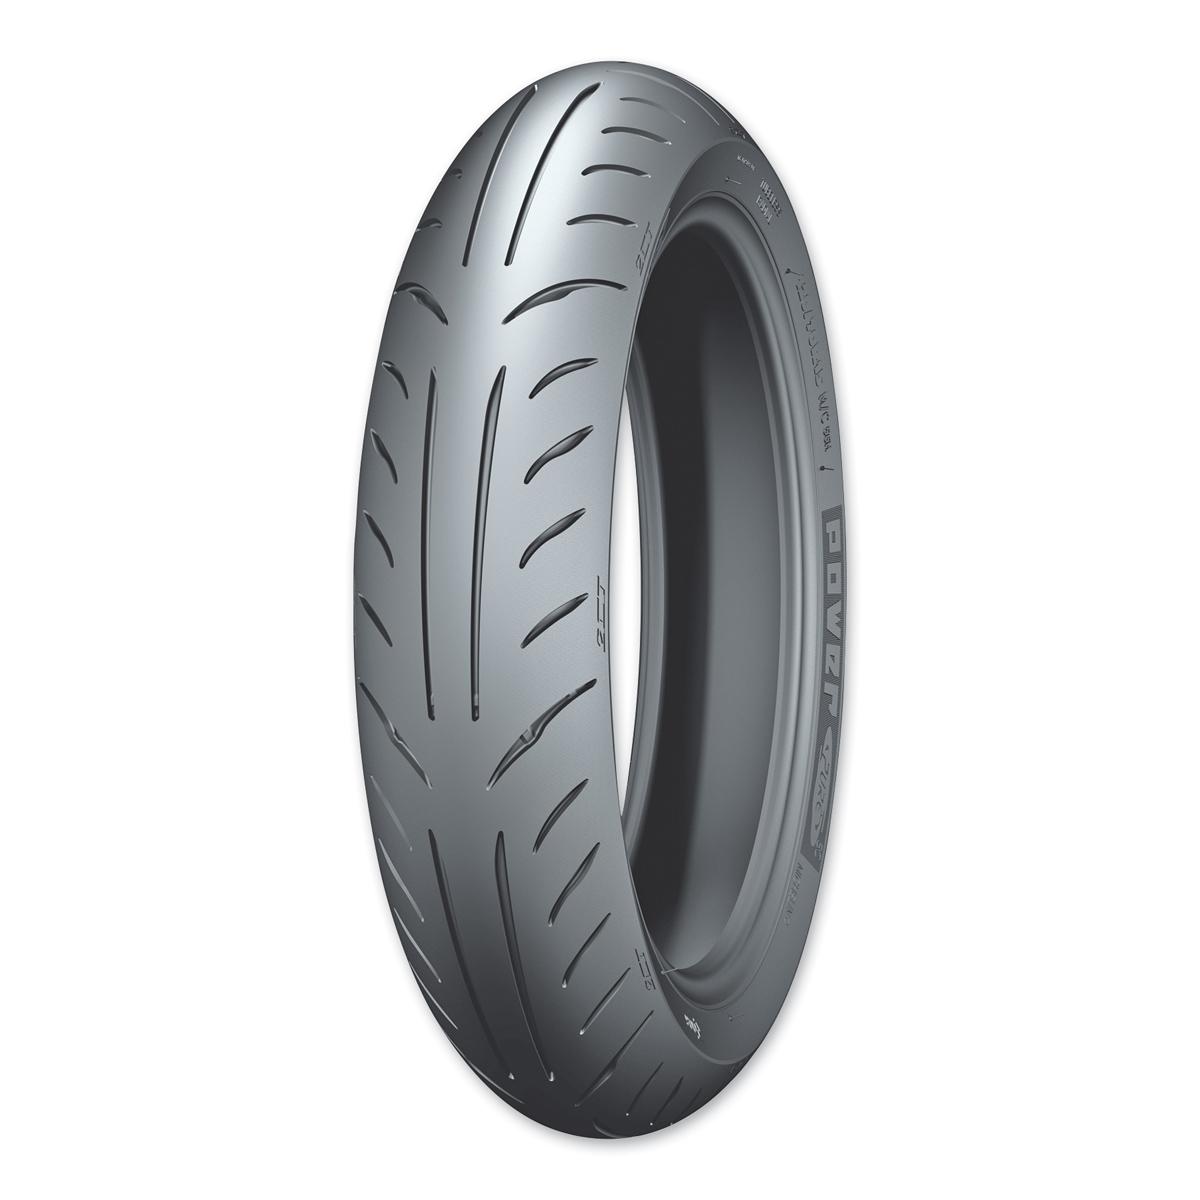 Michelin Power Pure SC 120/70-15 Front Tire